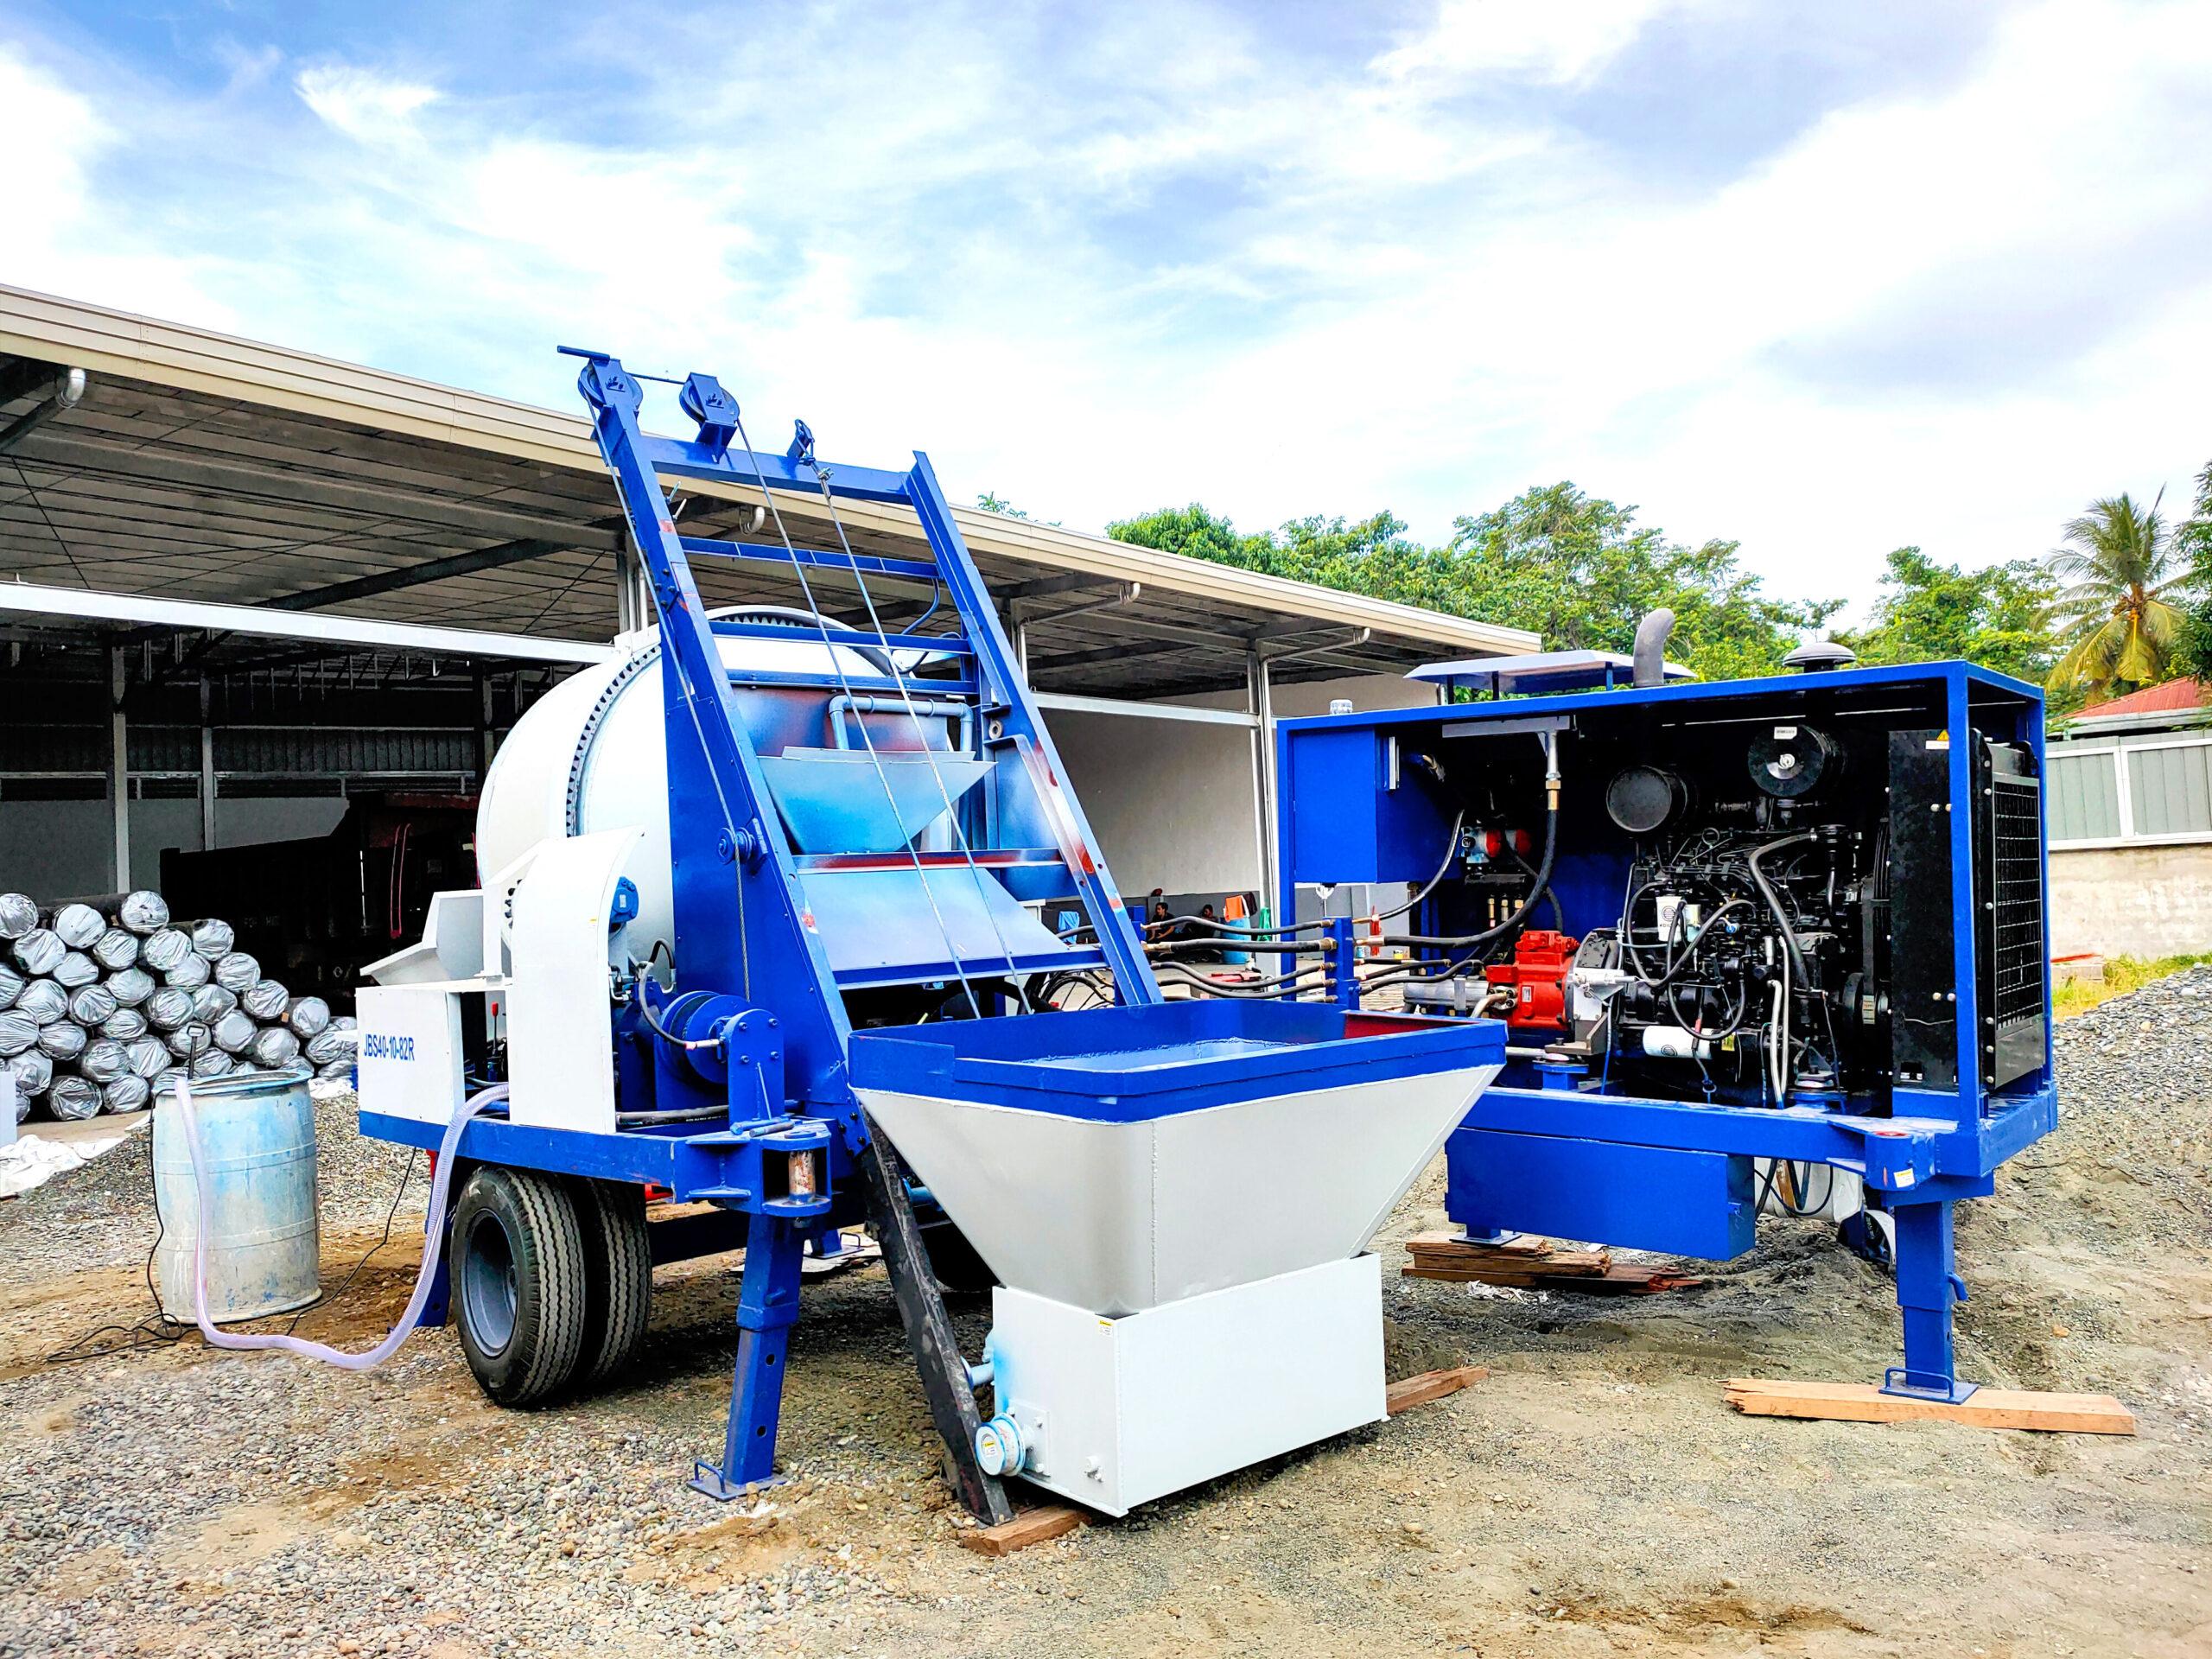 mixer pump sale in Sri Lanka